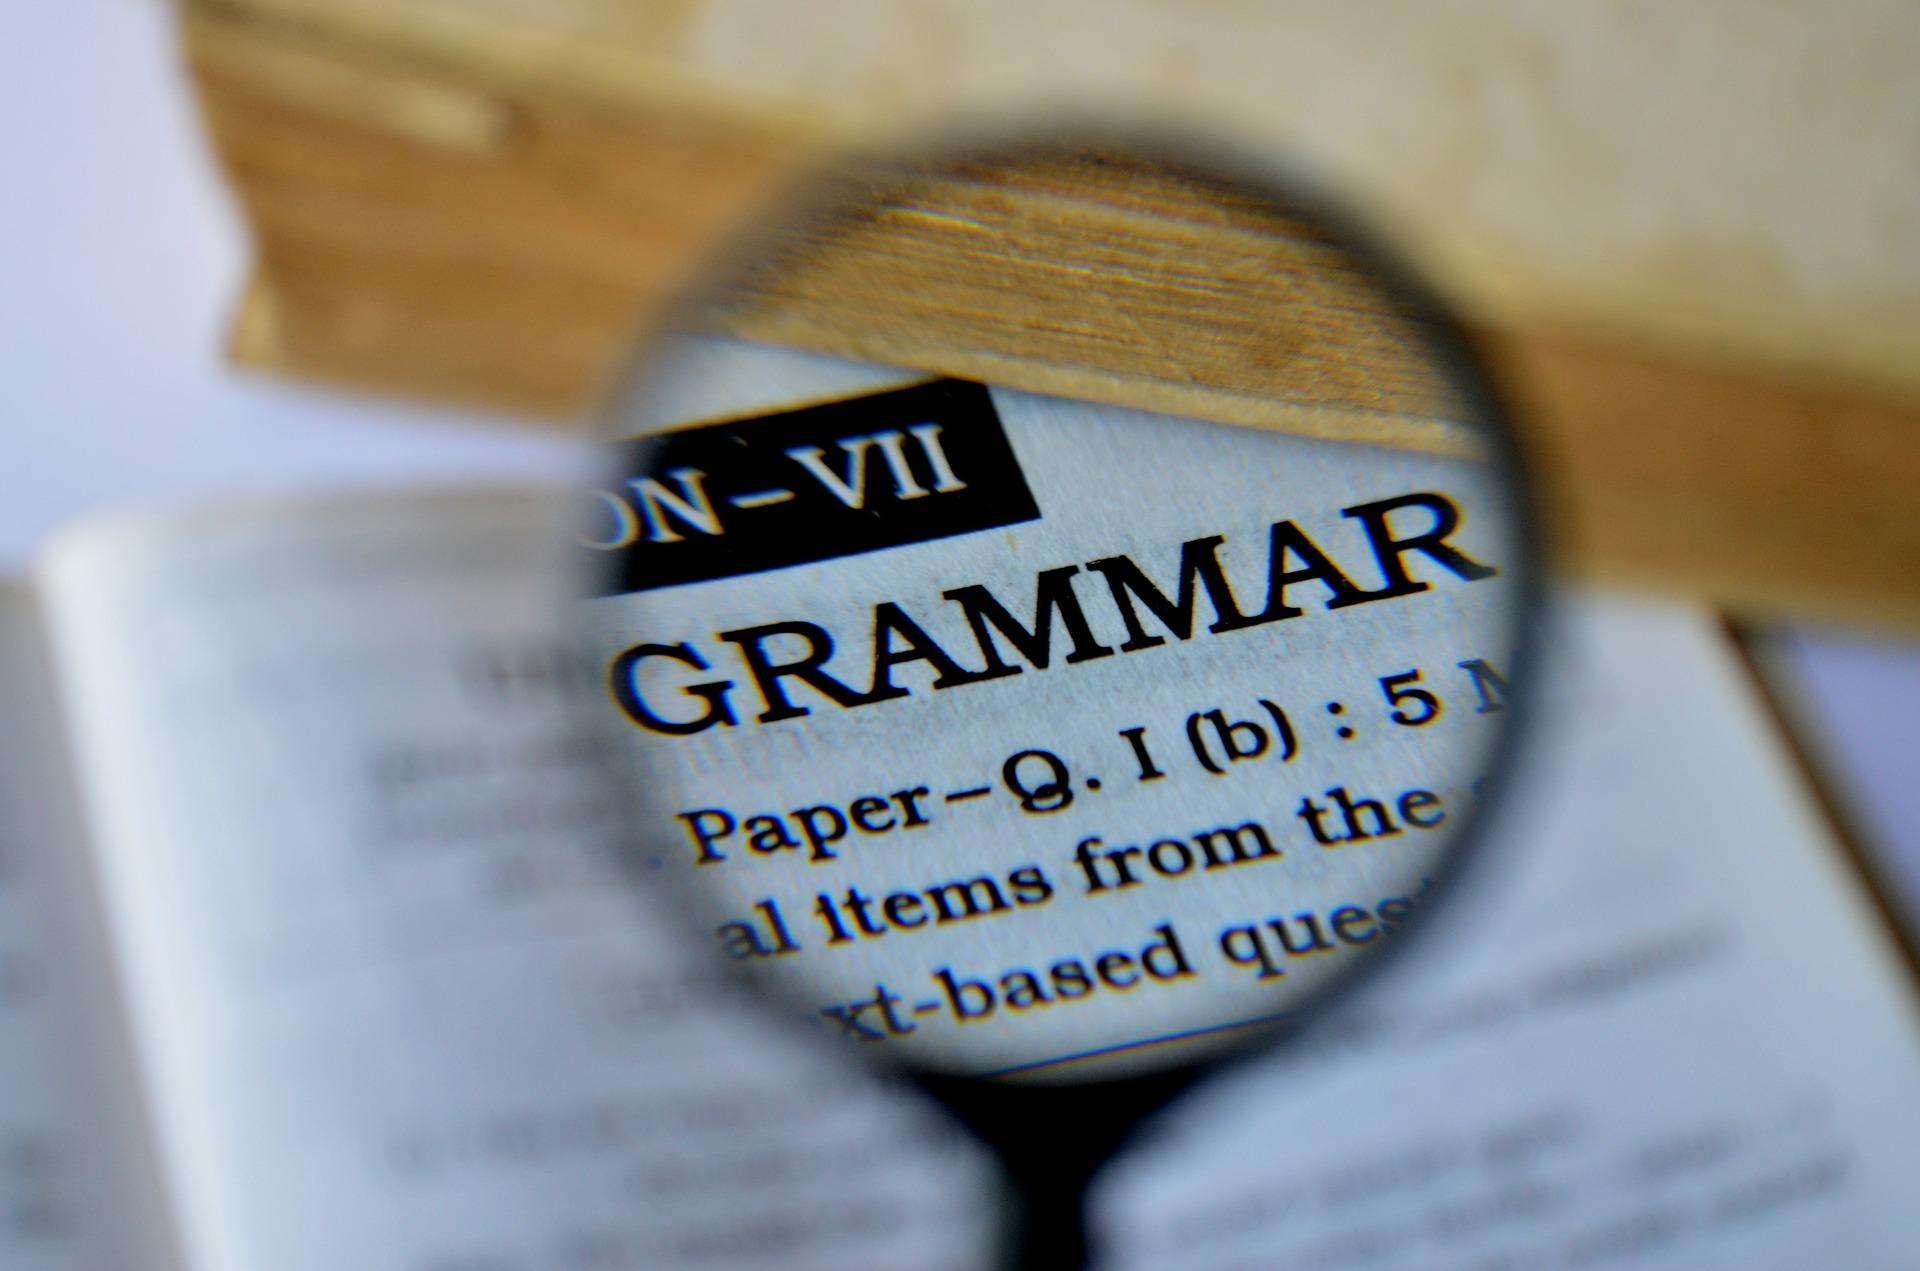 grammar-389907_1920.jpg